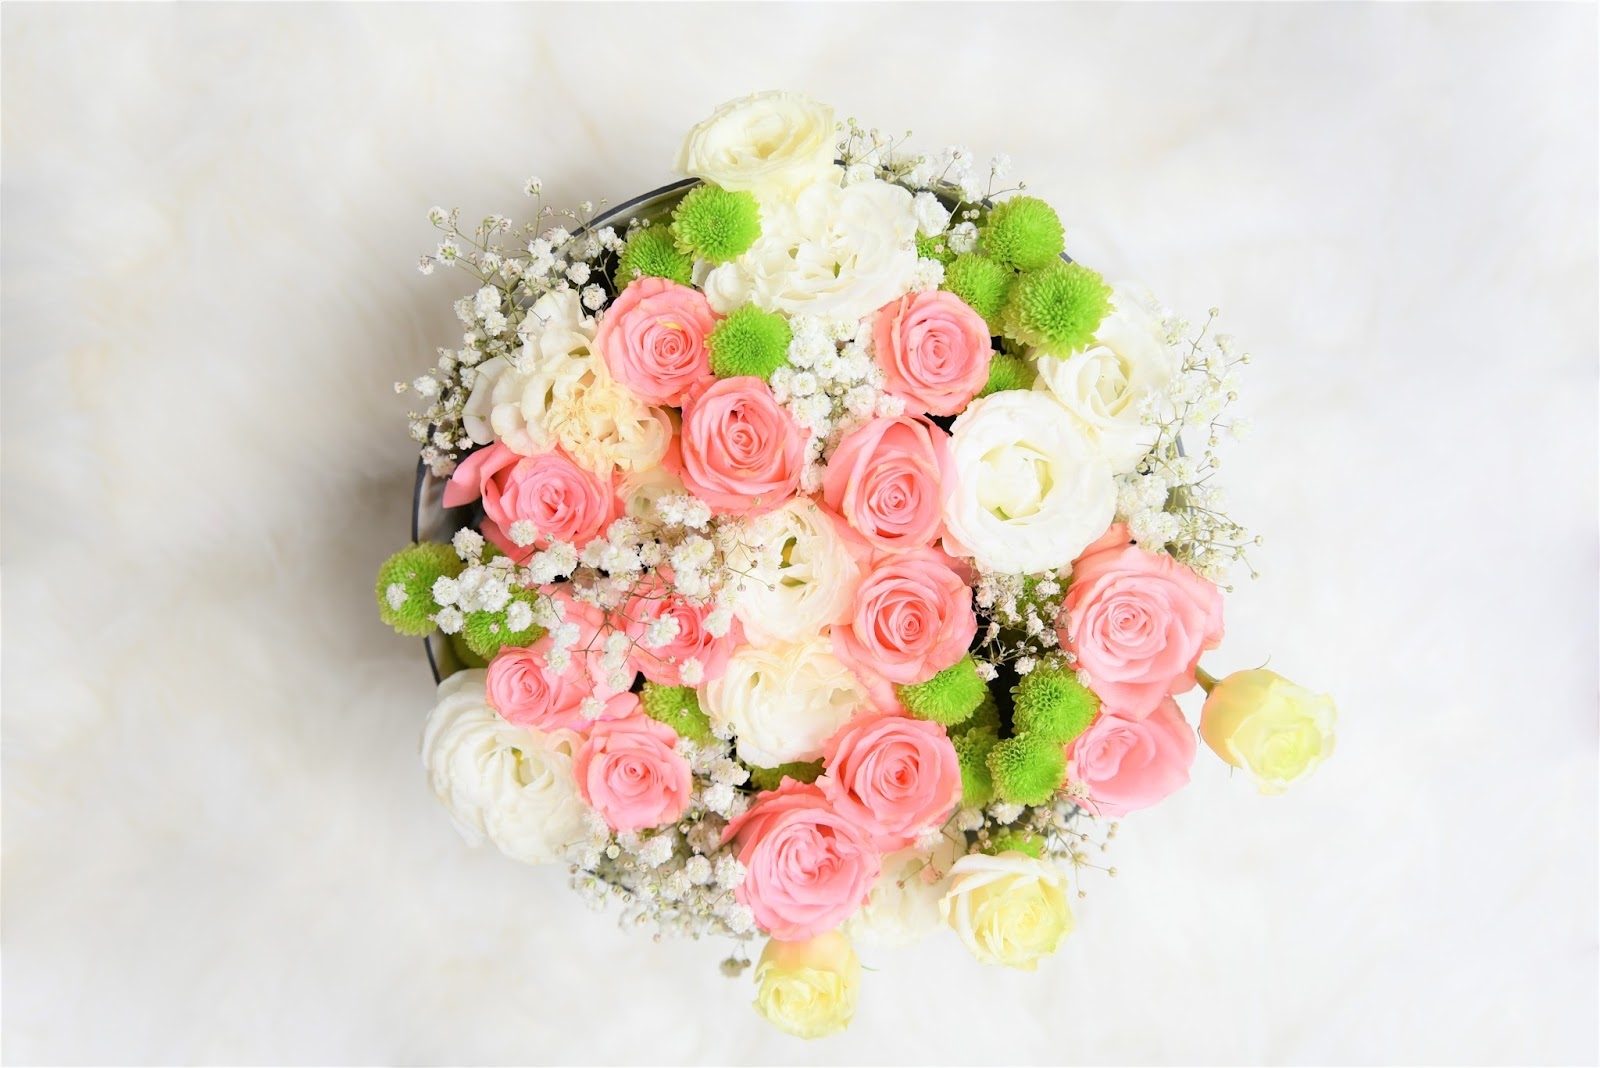 Chloe Wl Fresh Blooms From Floral Garage Sg